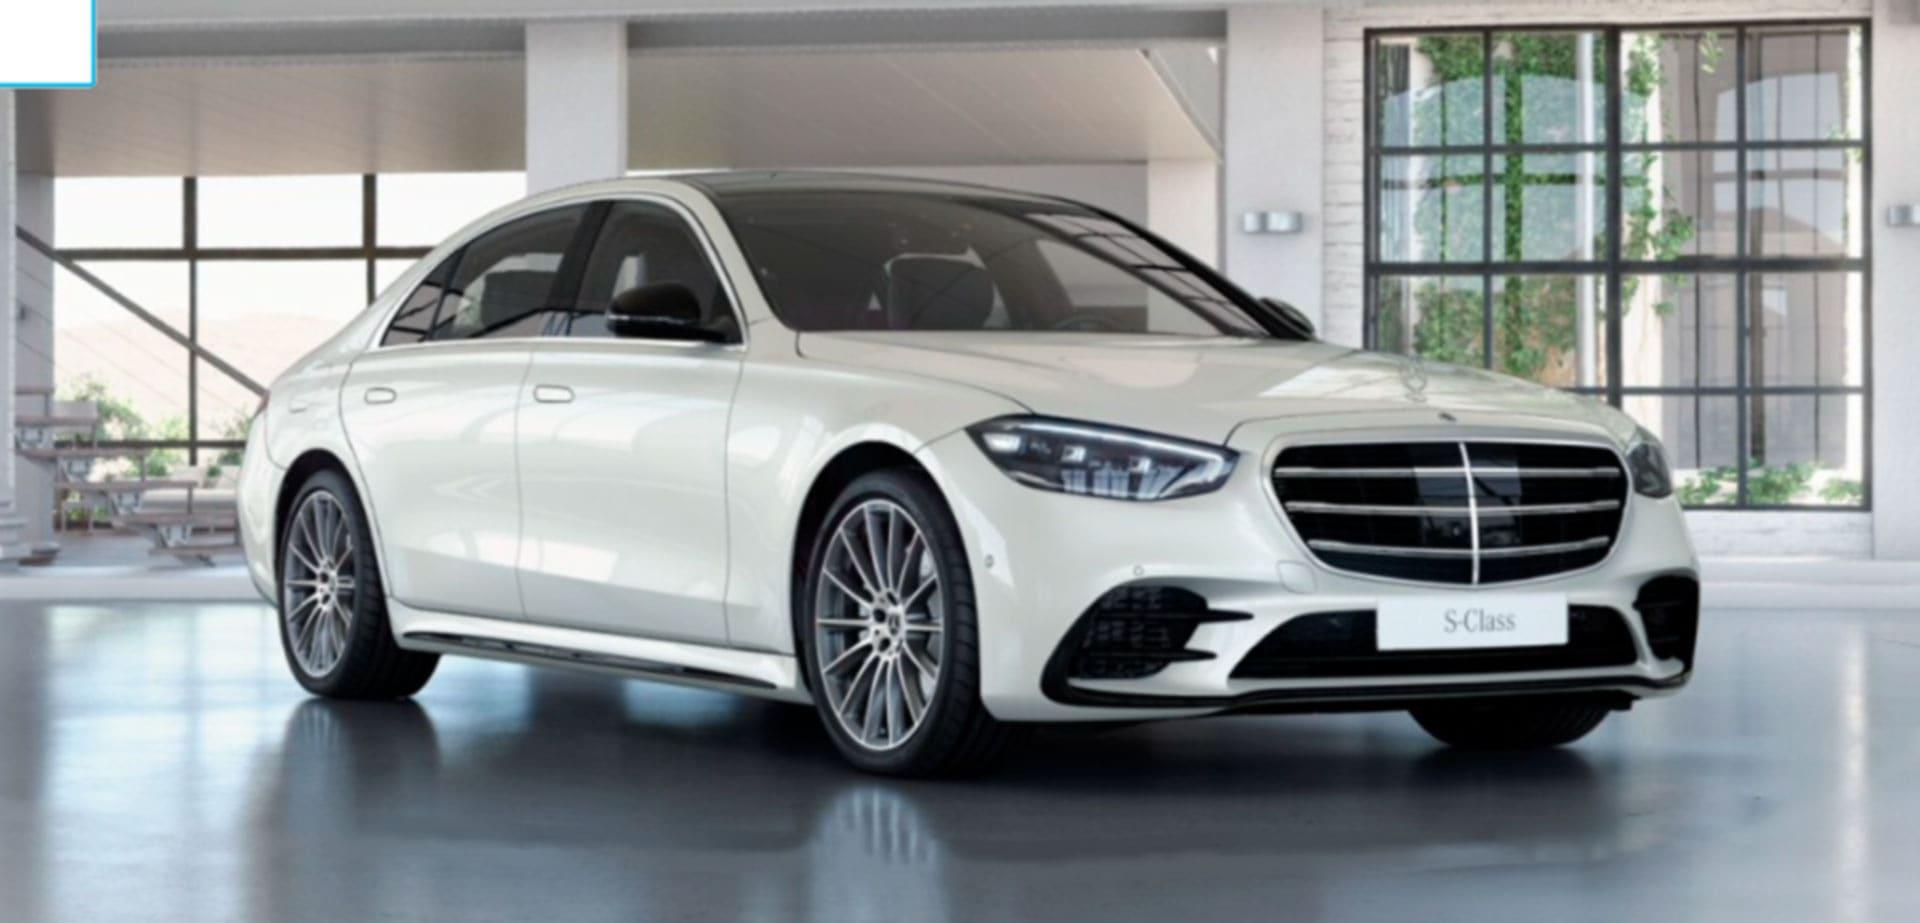 Mercedes-Benz S-Class Limousine 0152606148